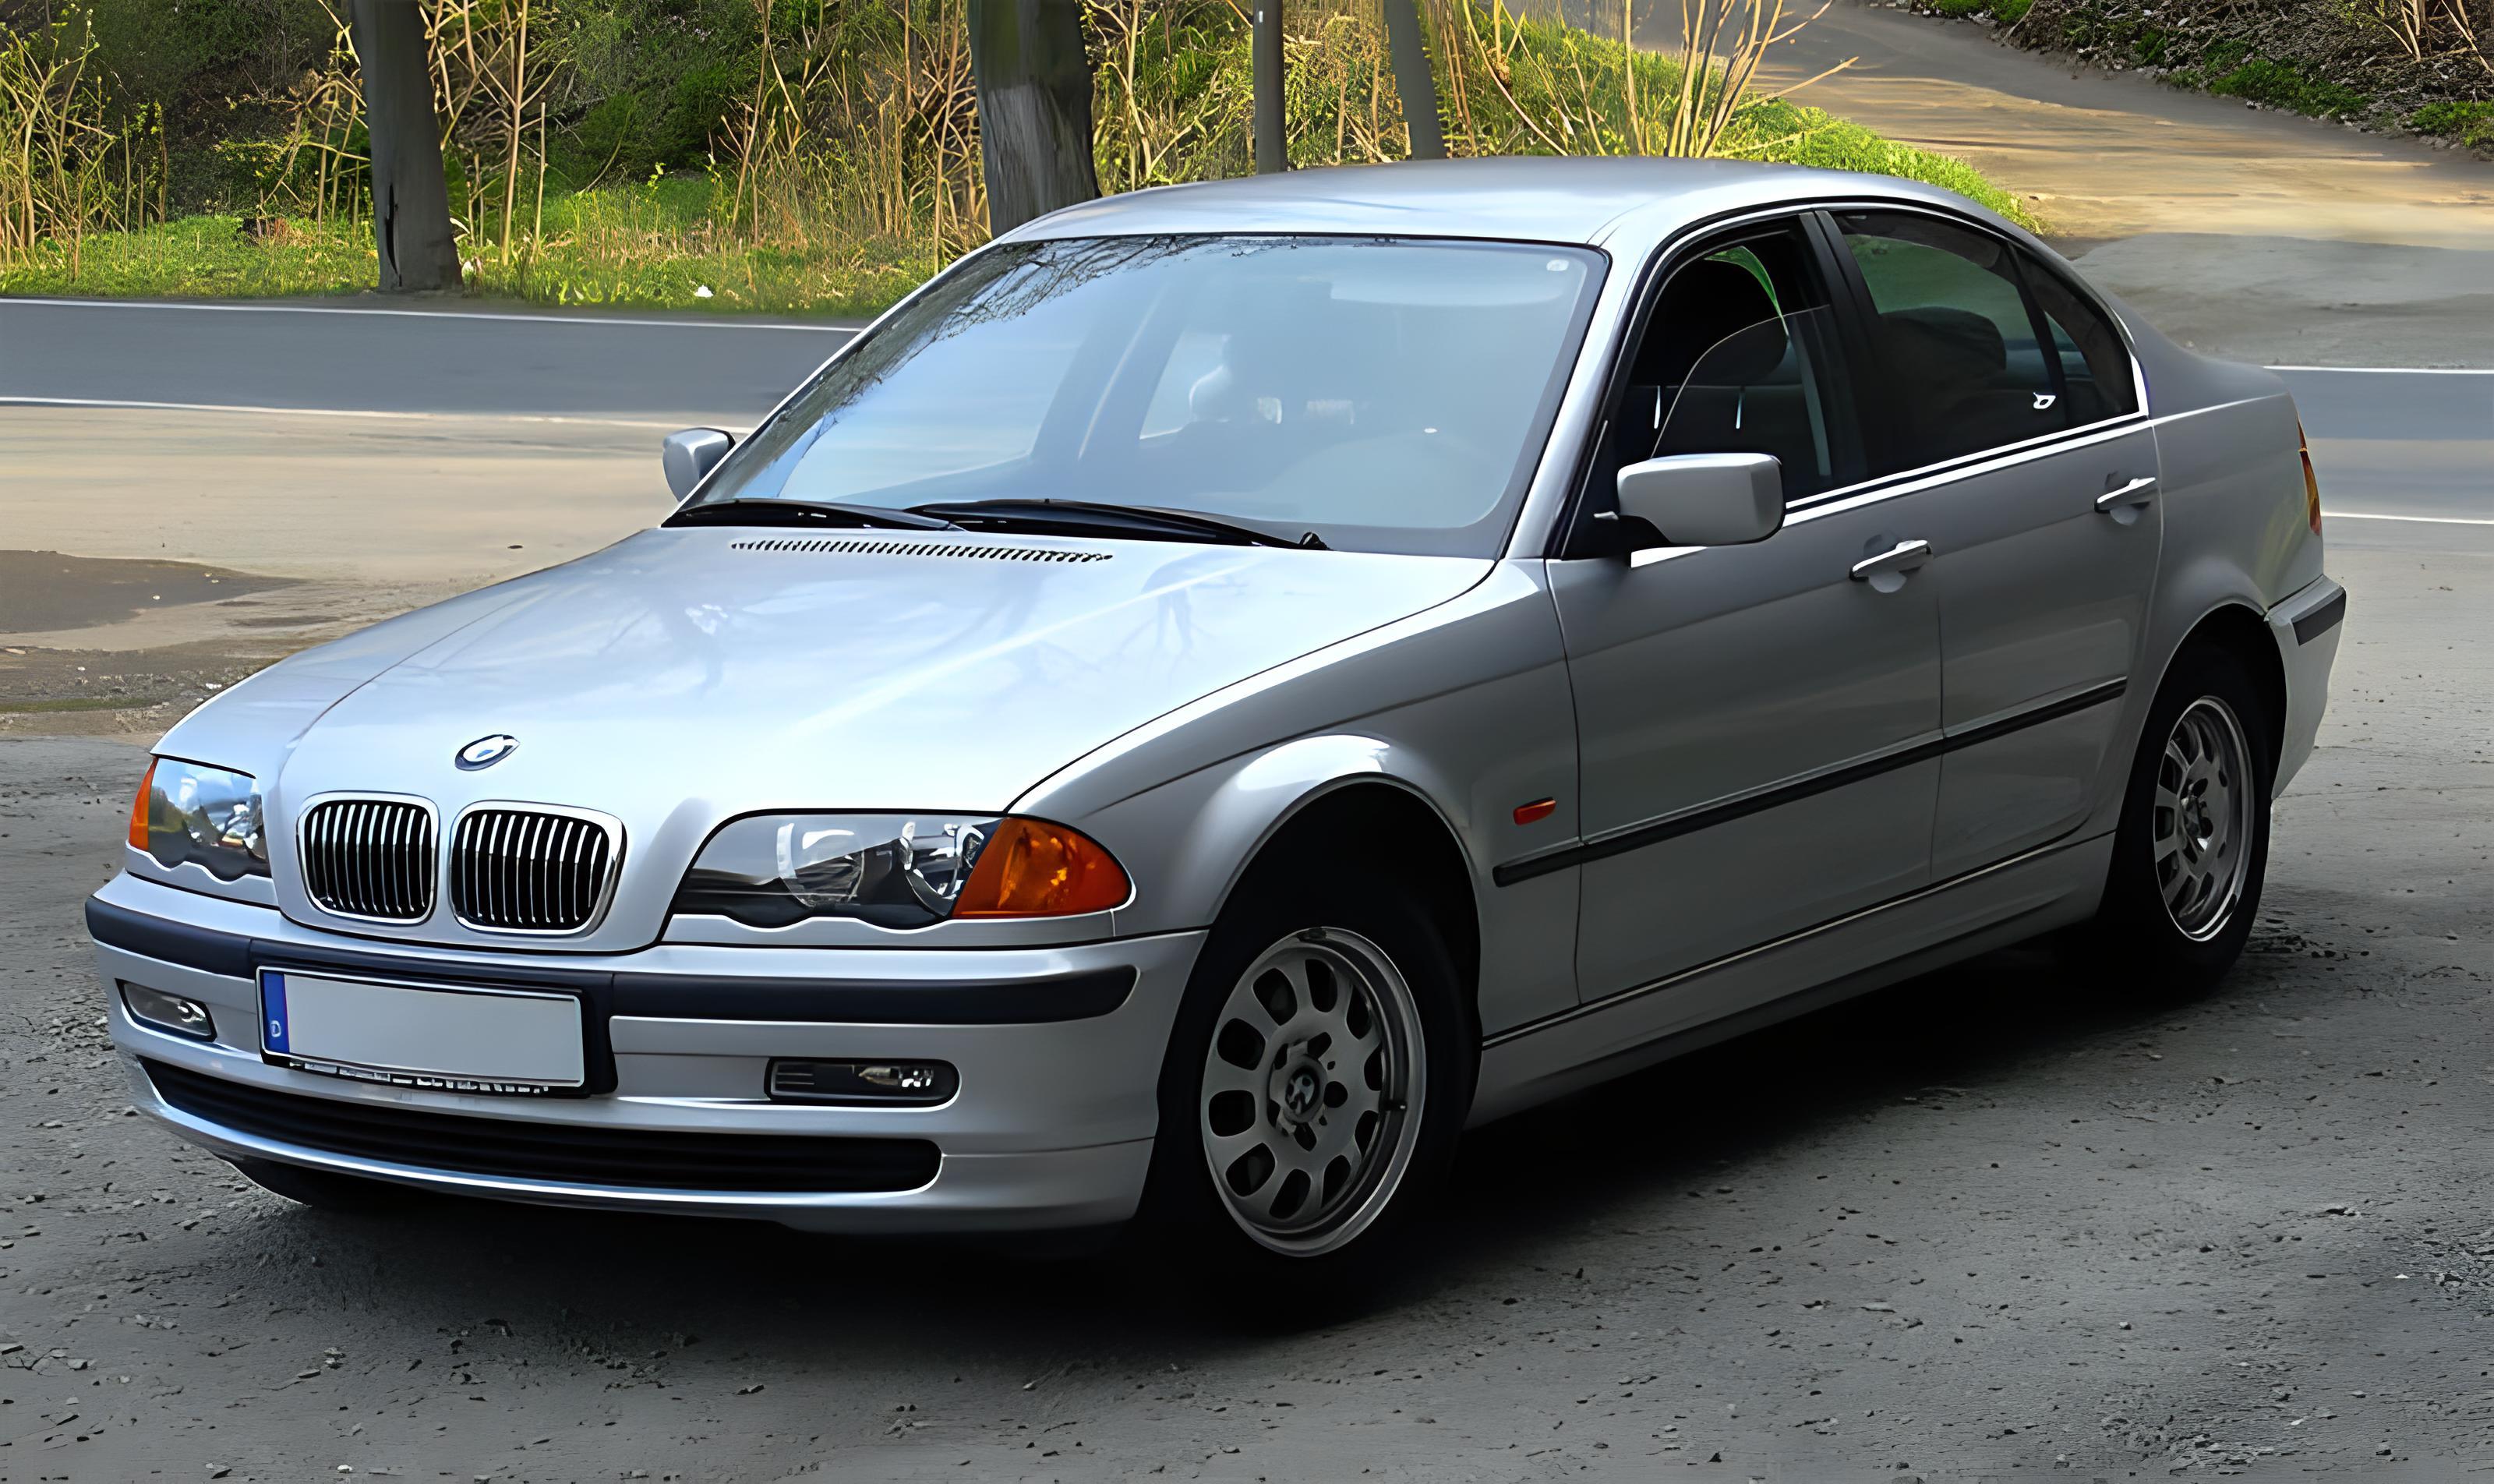 BMW 320 technical details, history, photos on Better Parts LTD